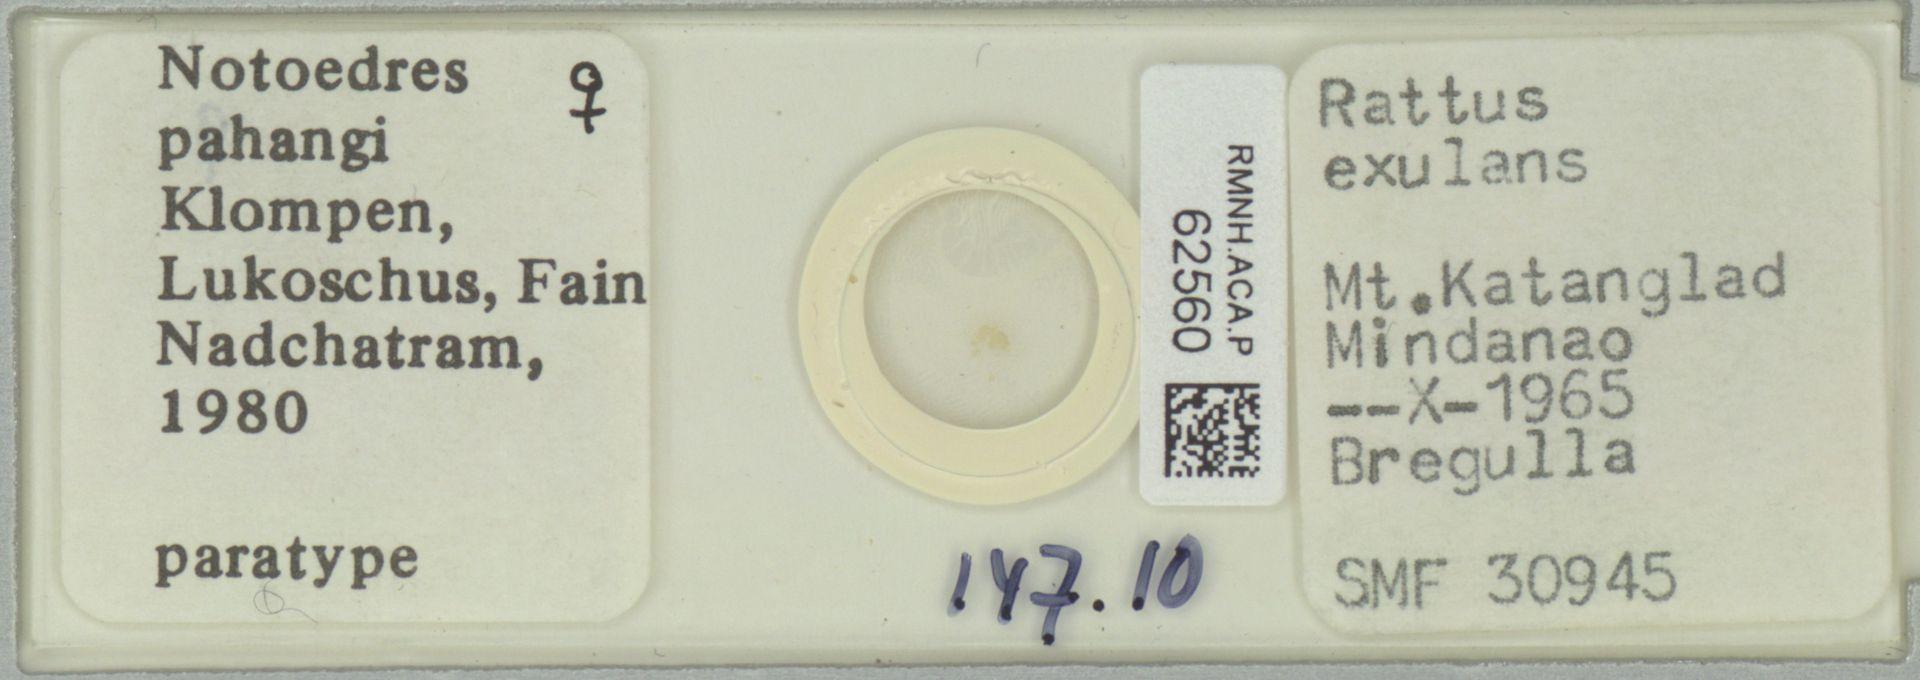 RMNH.ACA.P.62560 | Notoedres pahangi Klompen, Lukoschus, Fain Nadchatram, 1980